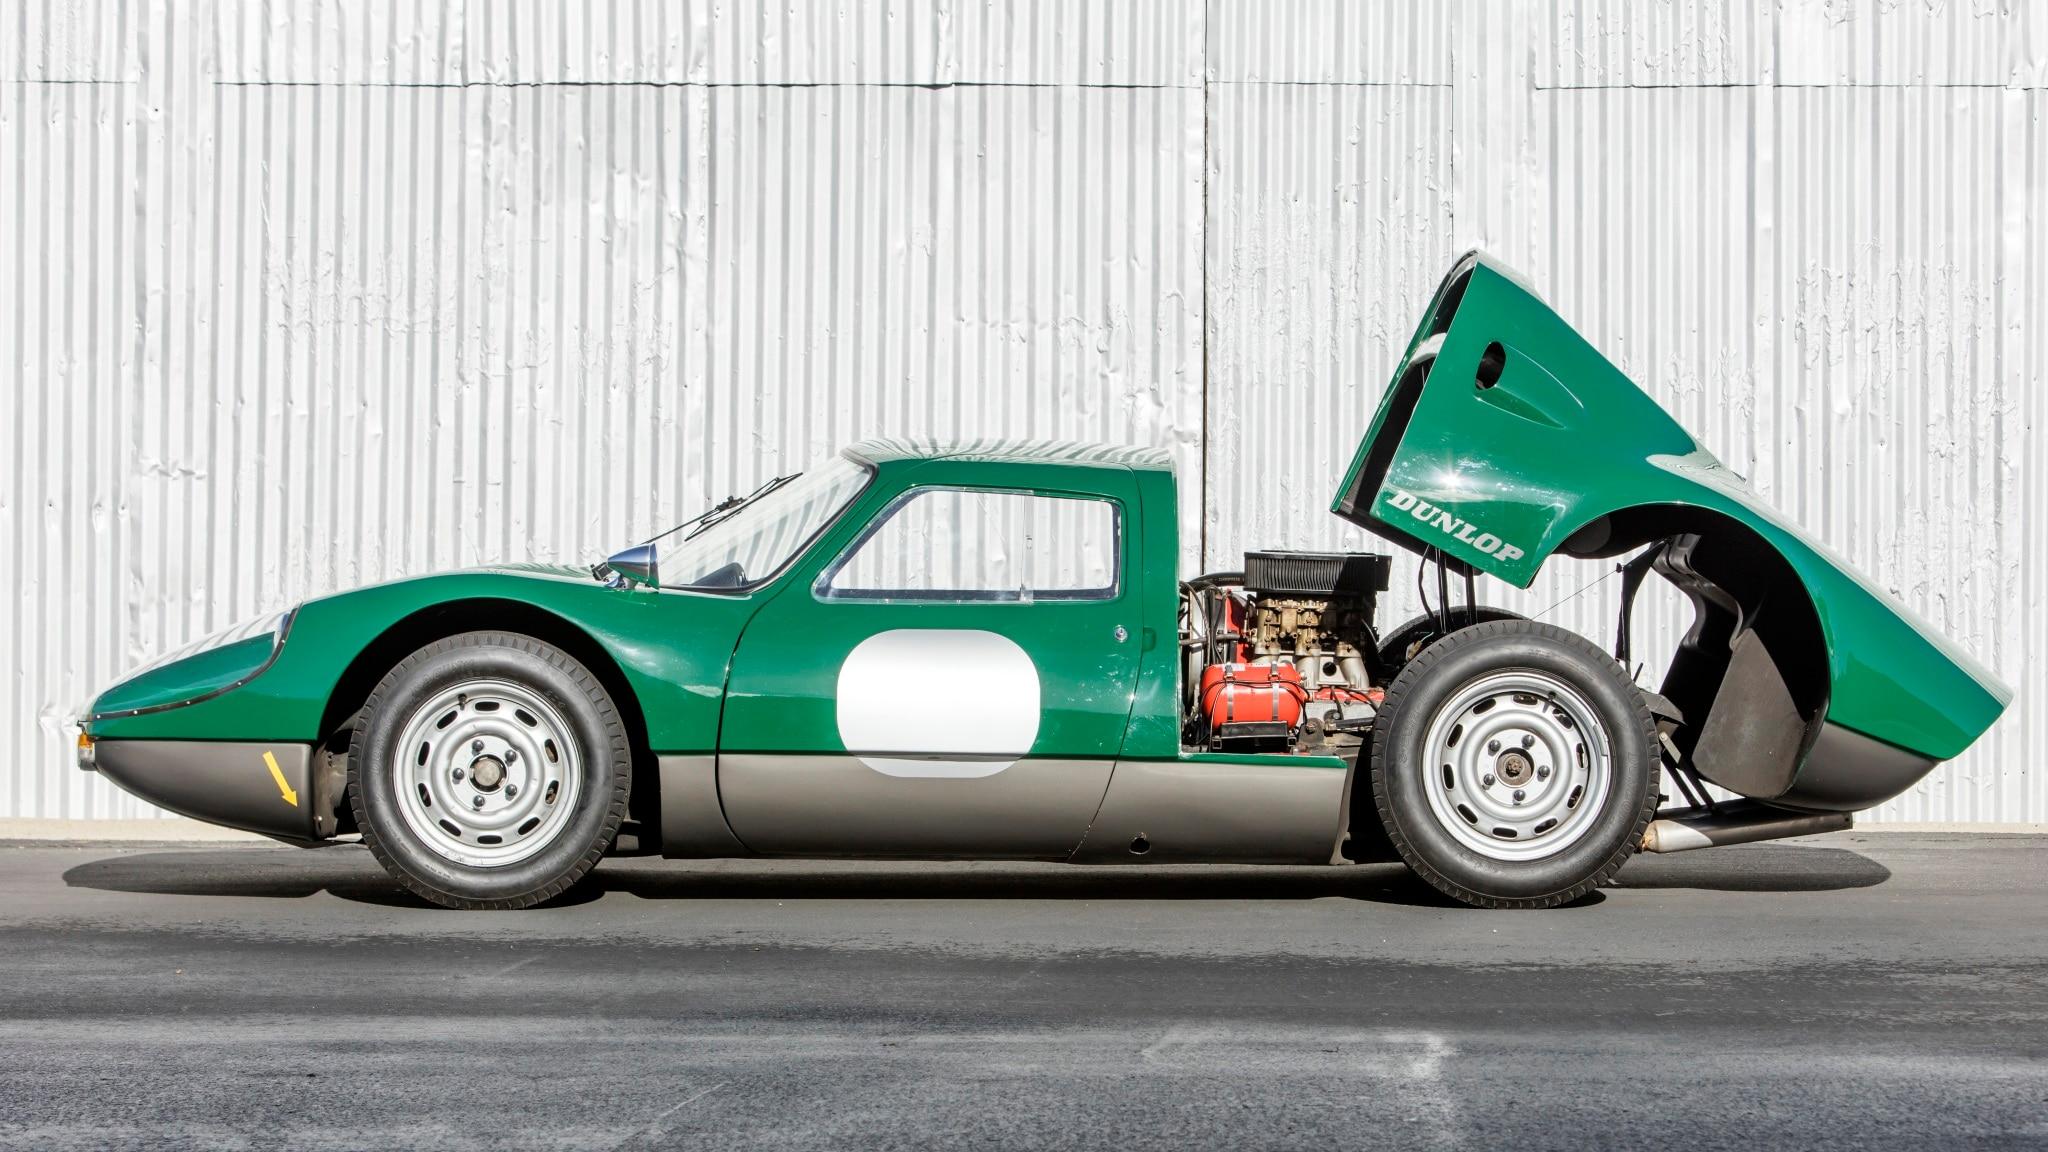 1964 Porsche 904 GTS Side View